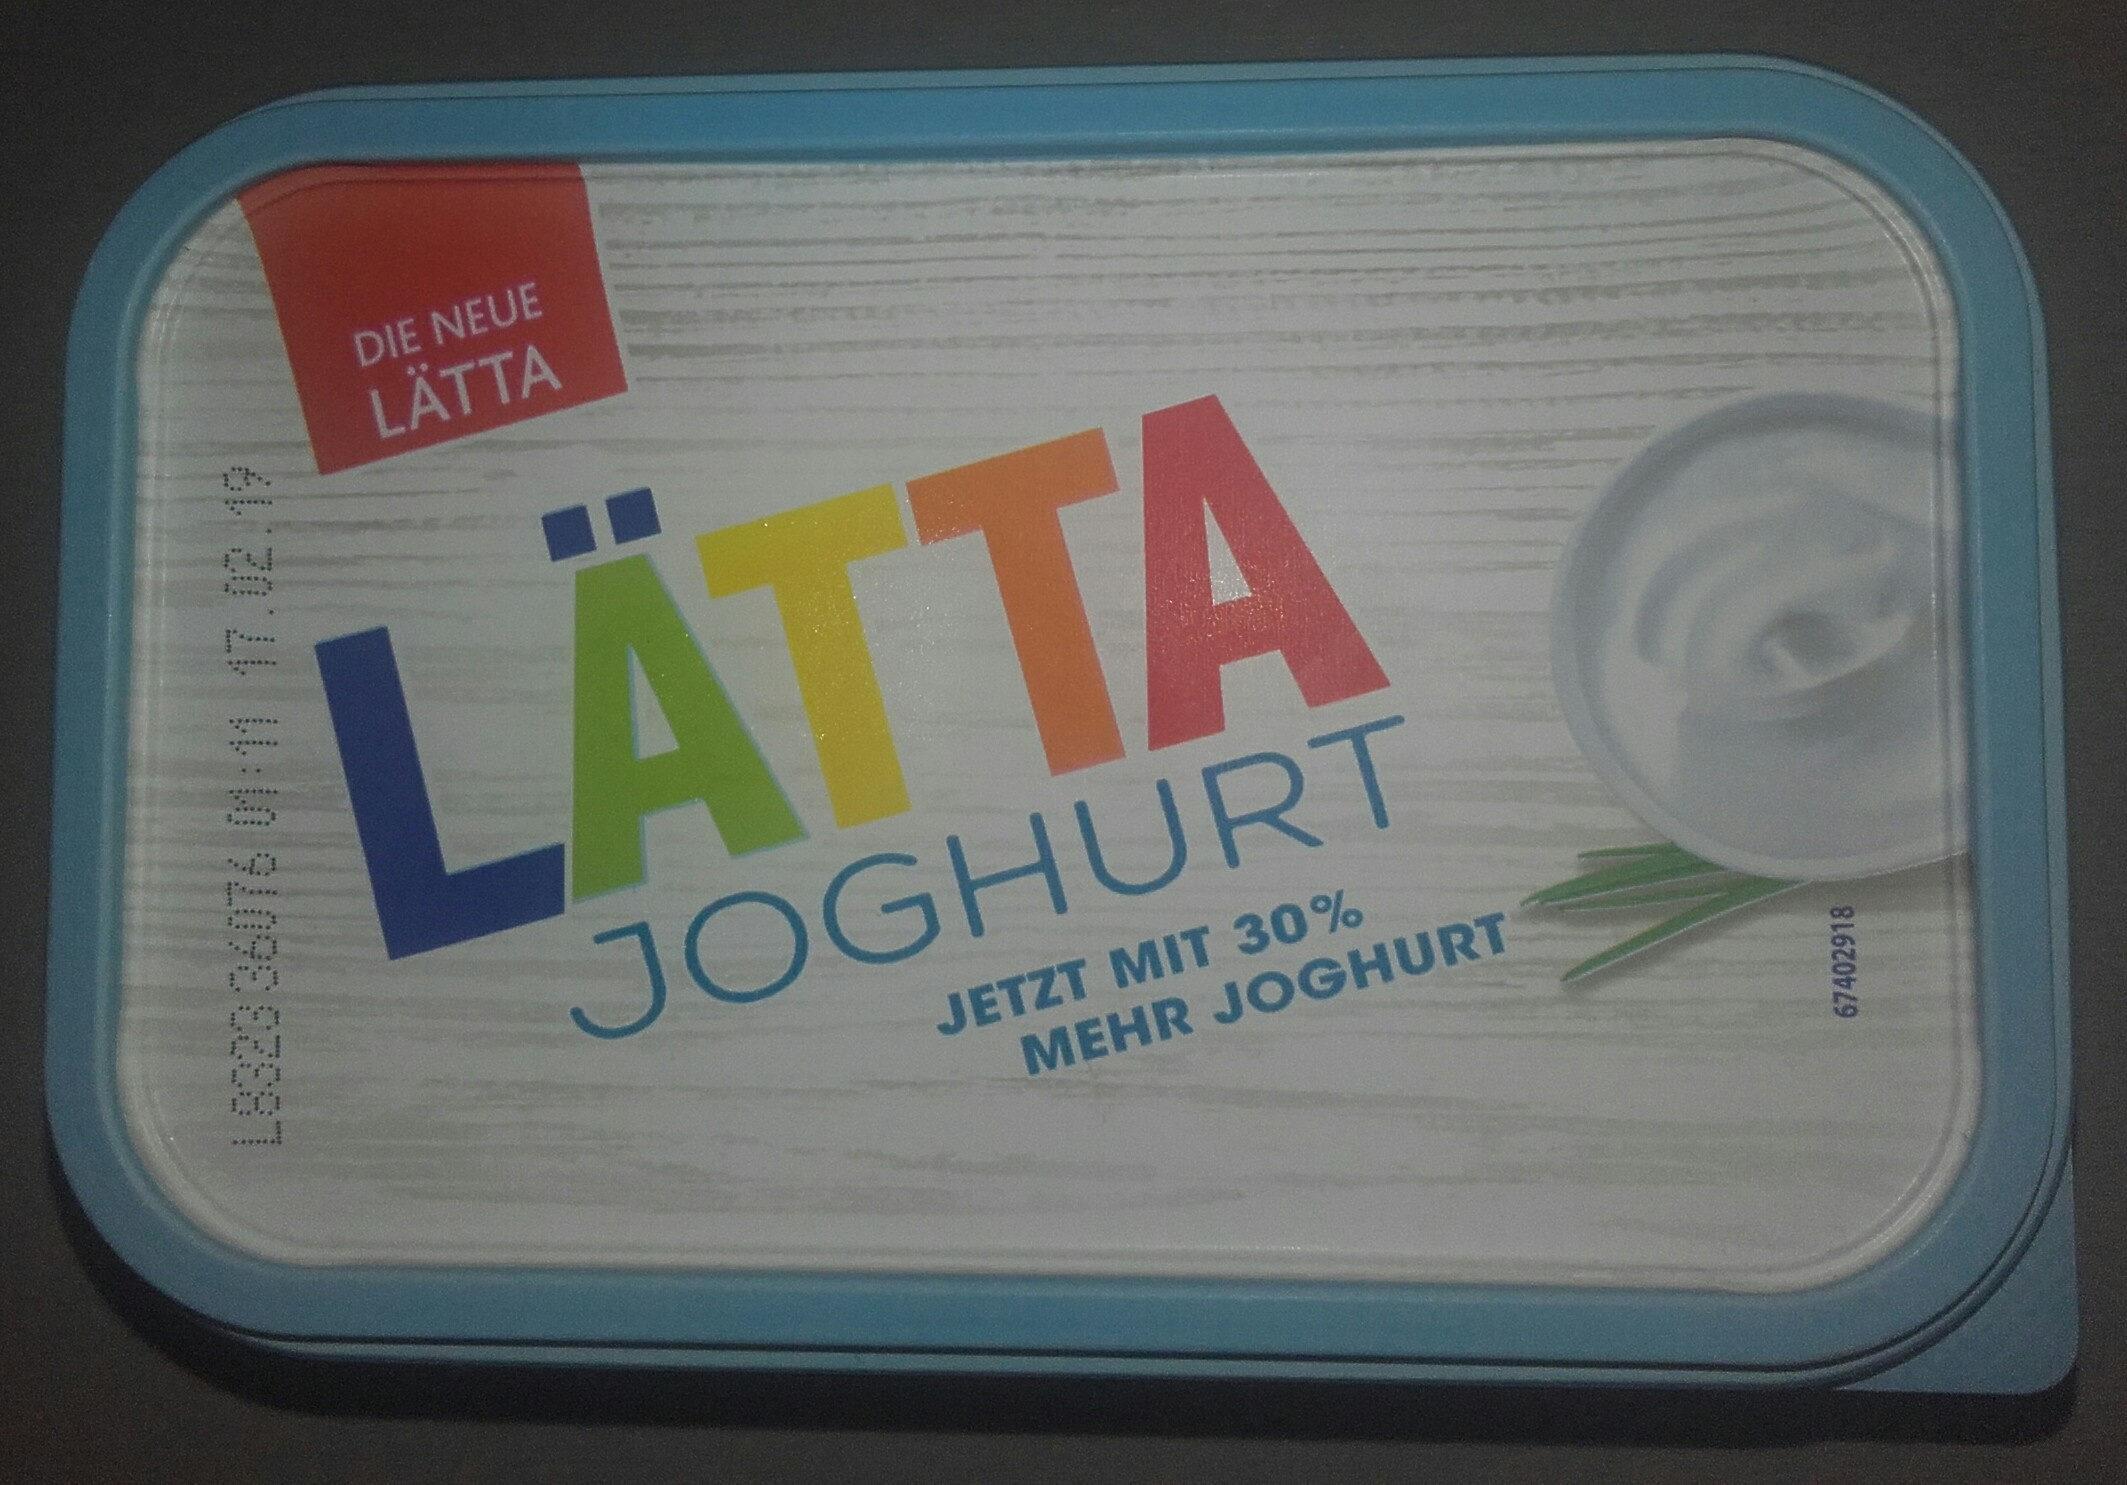 Lätta Joghurt - Prodotto - de